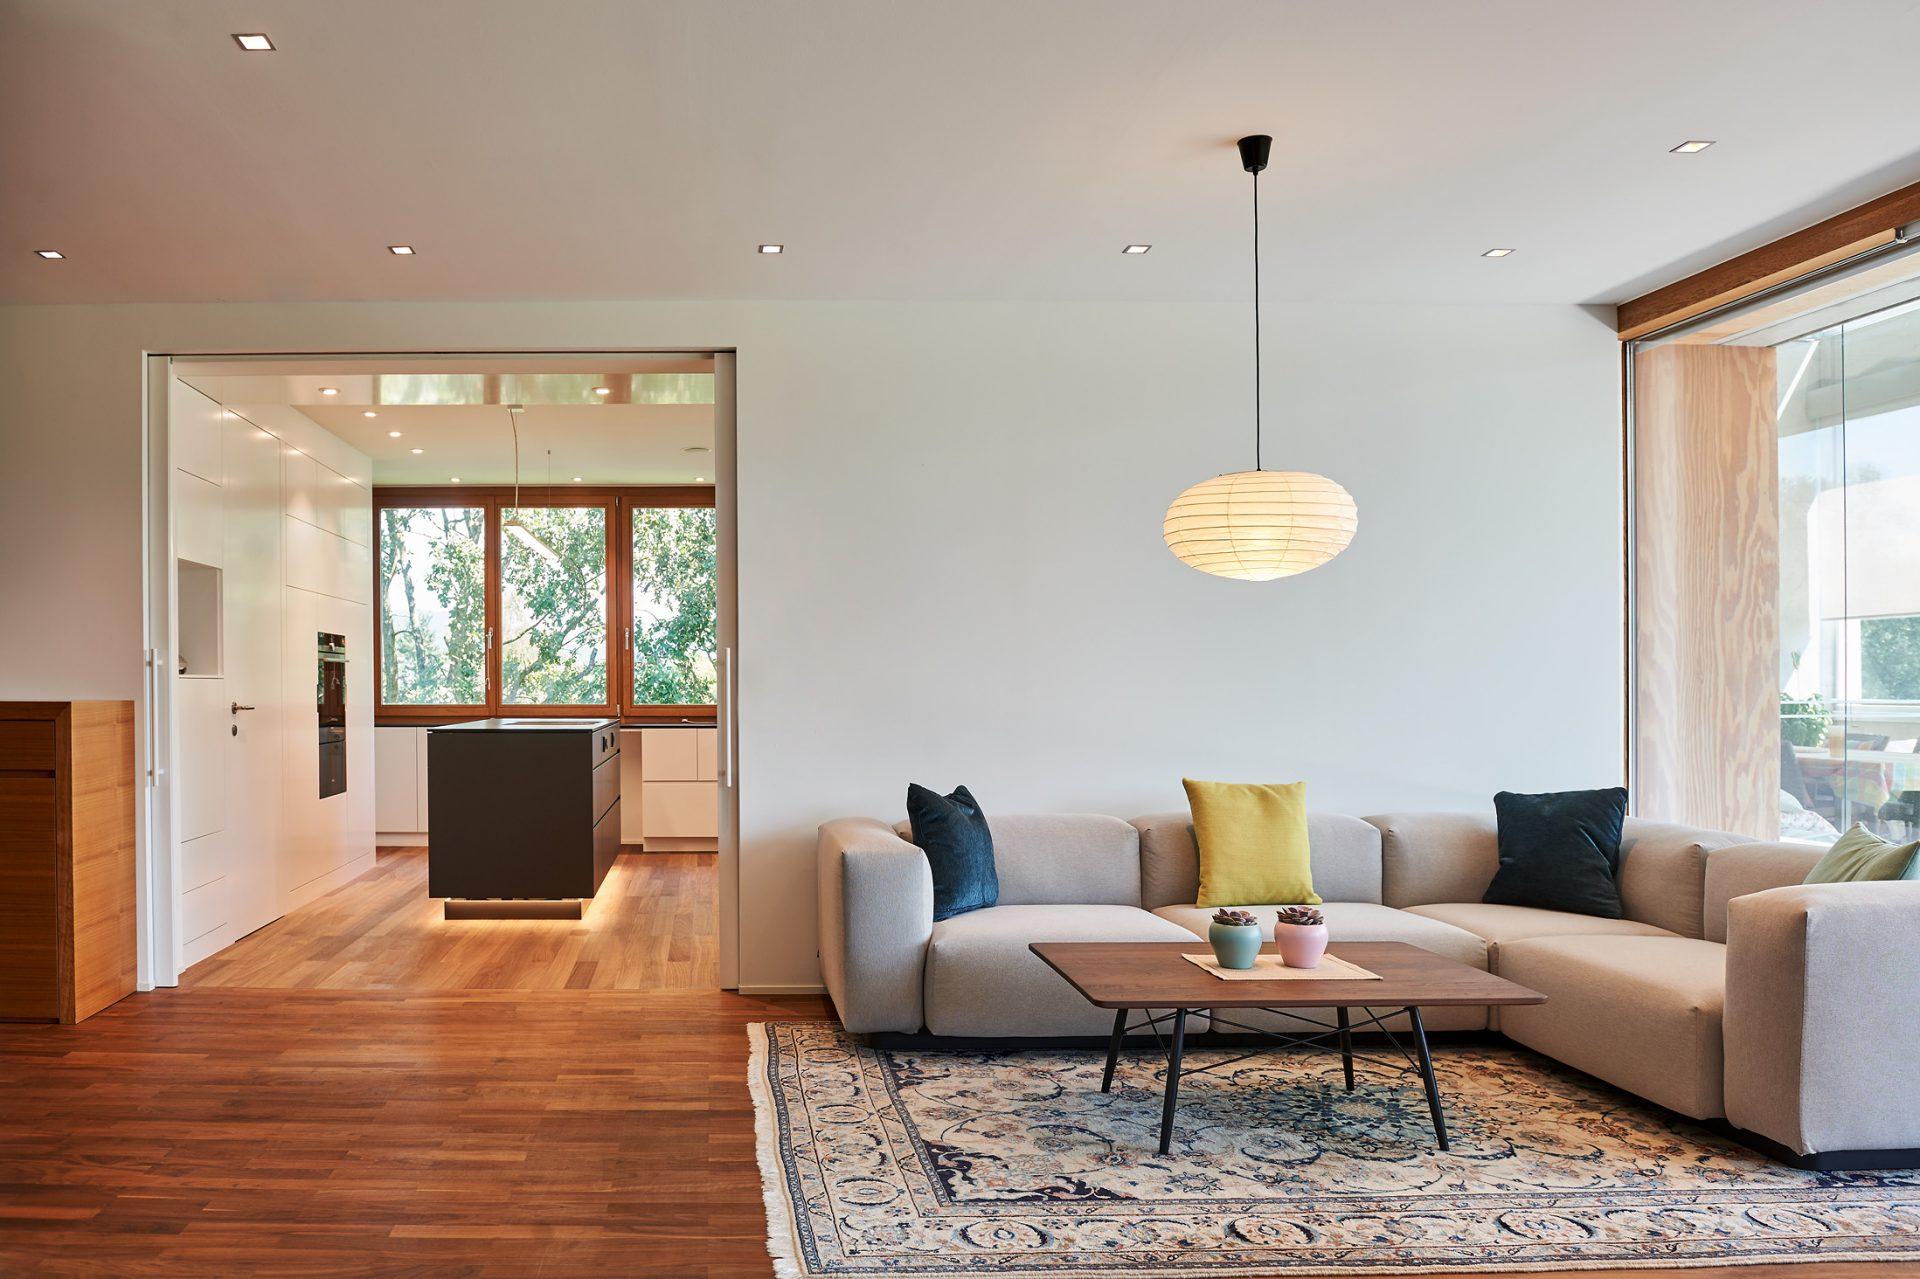 Dachgeschosswohnung a ladenbau vorarlberg armellini for Dachgeschosswohnung design